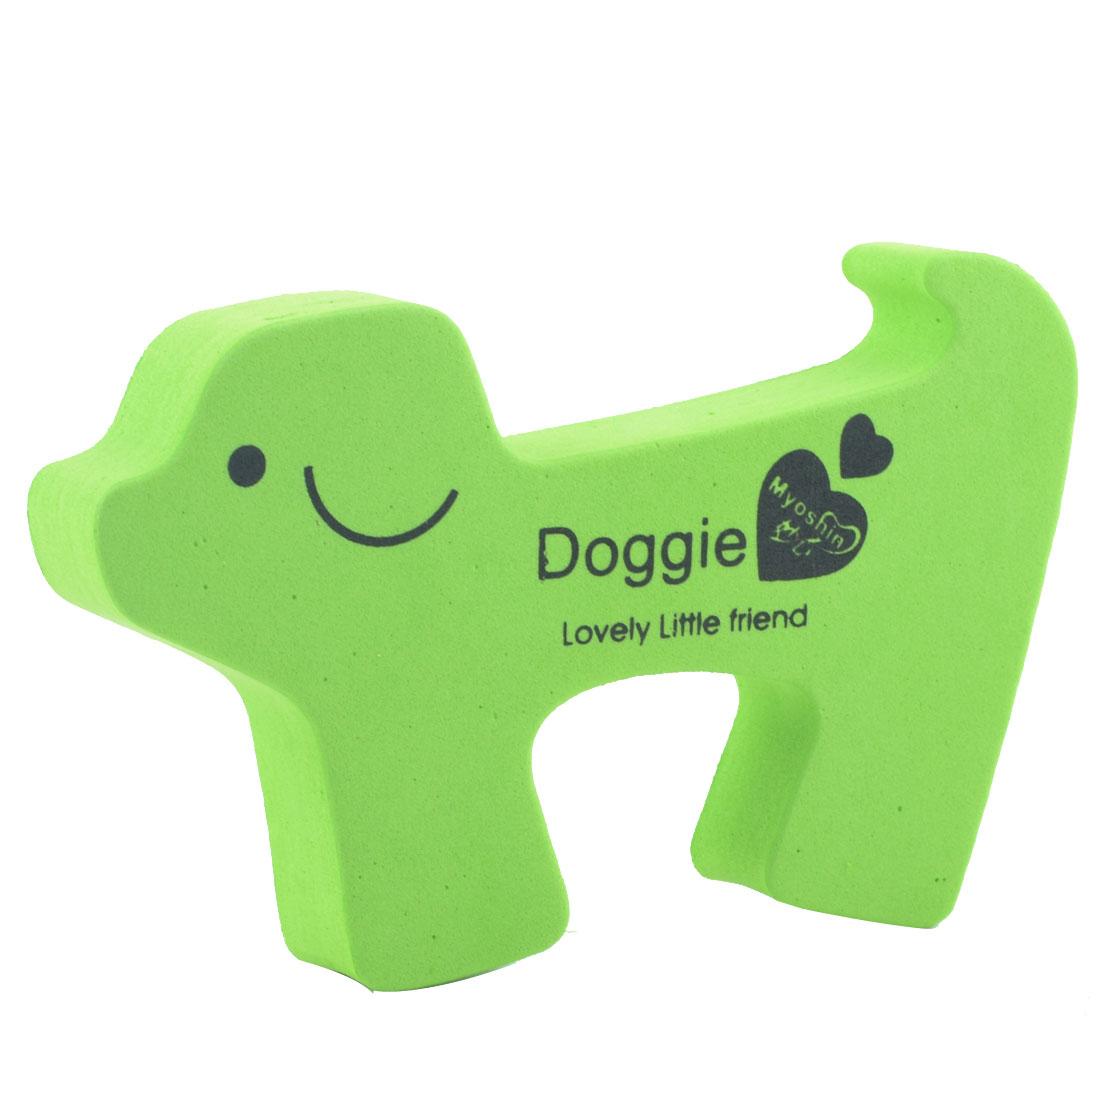 EVA Lovely Green Doggie Shape Finger Safety Guard Doorstop Door Stopper Lock